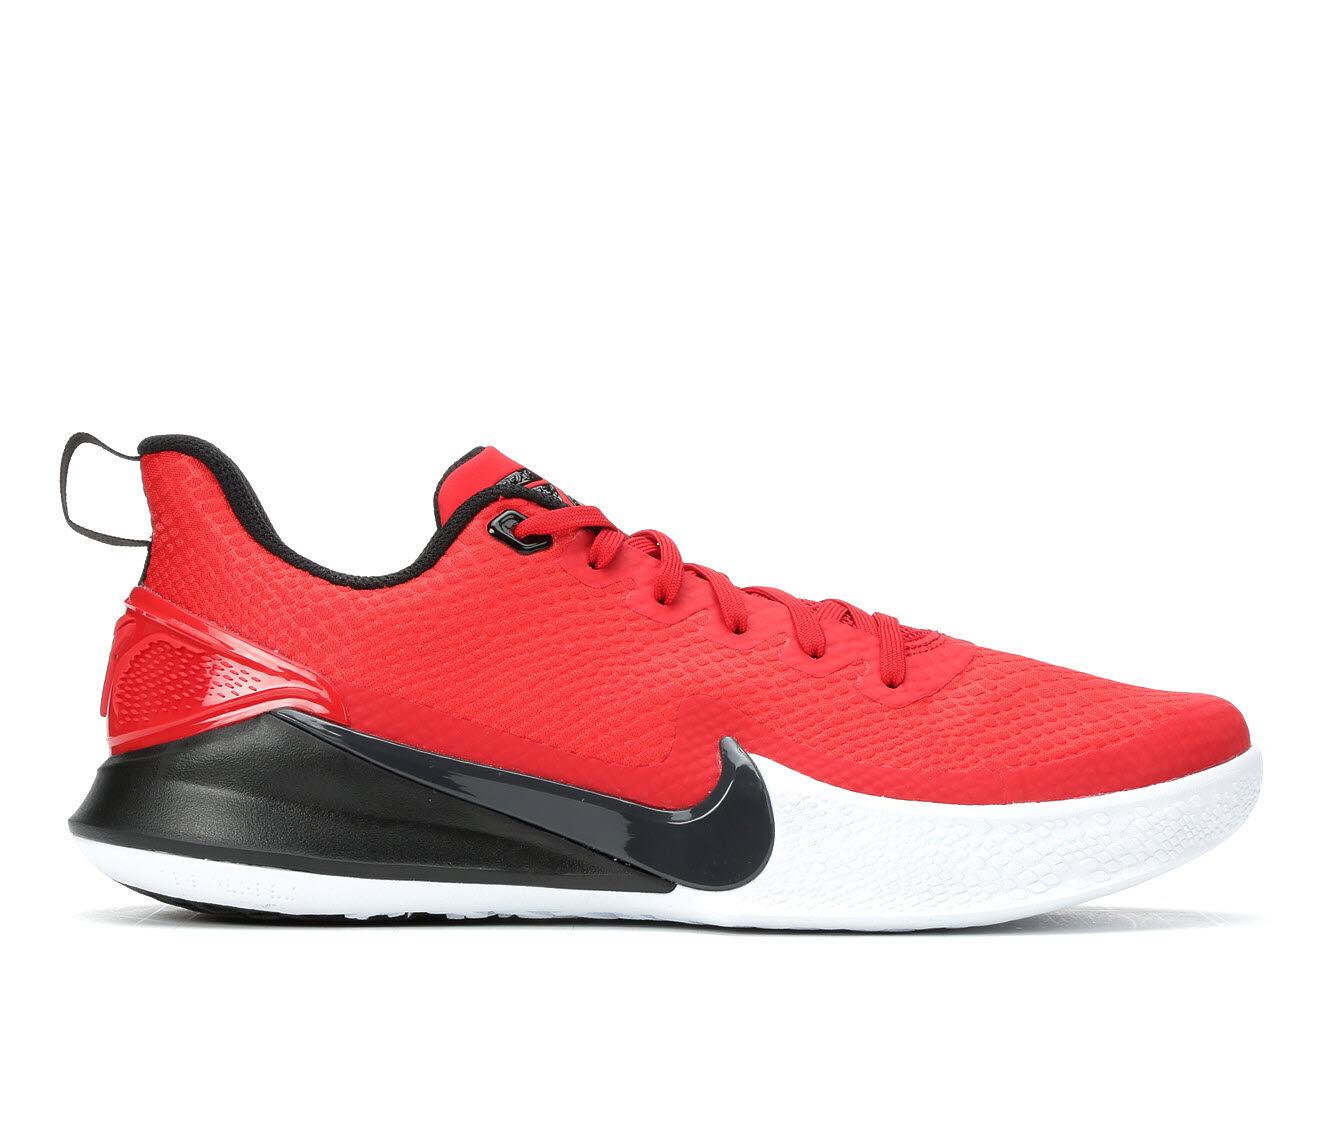 Men's Nike Mamba Rage Basketball Shoes Red/Blk/Wht 600